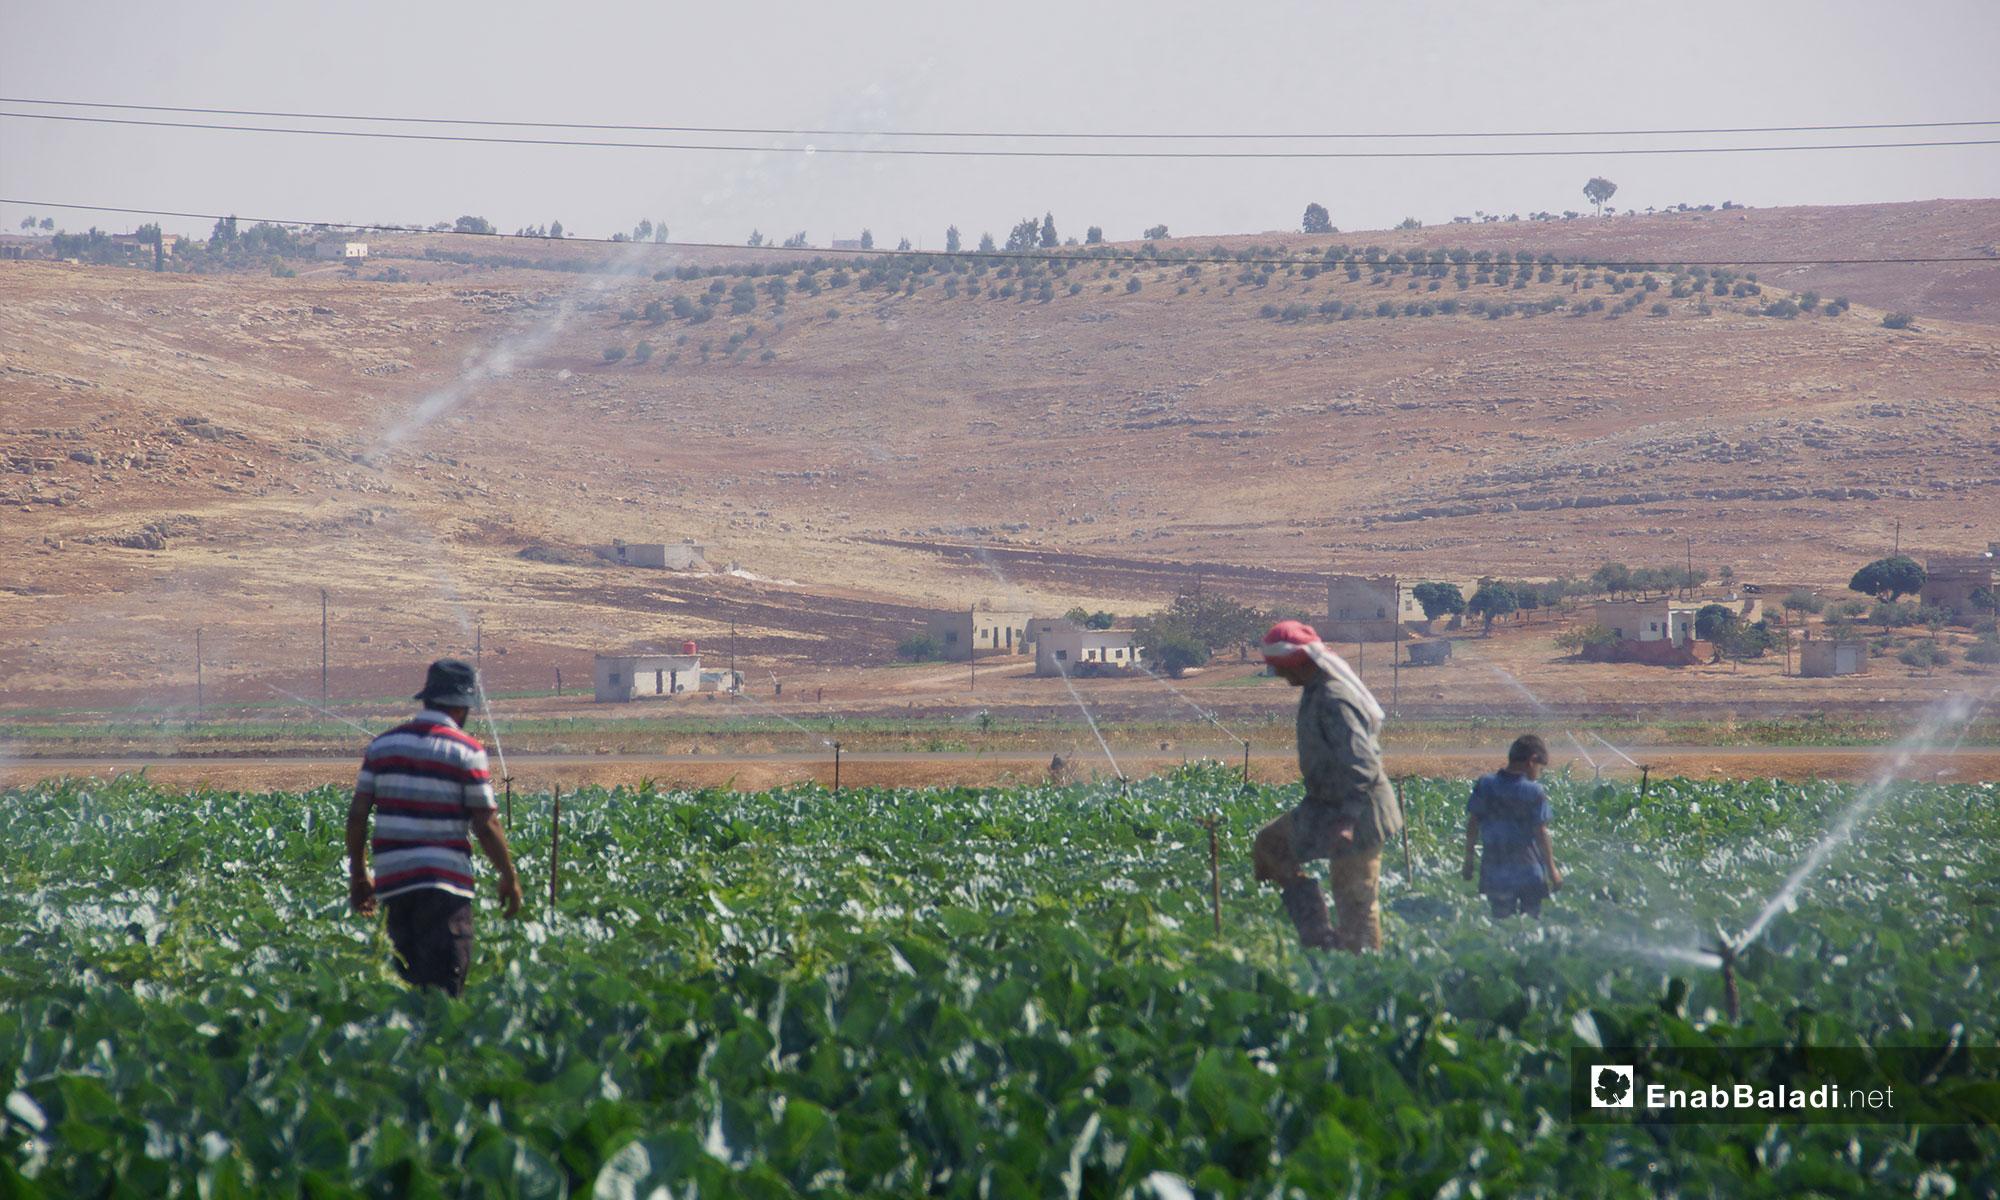 Vegetable farming in rural Hama – August 29, 2018 (Enab Baladi)